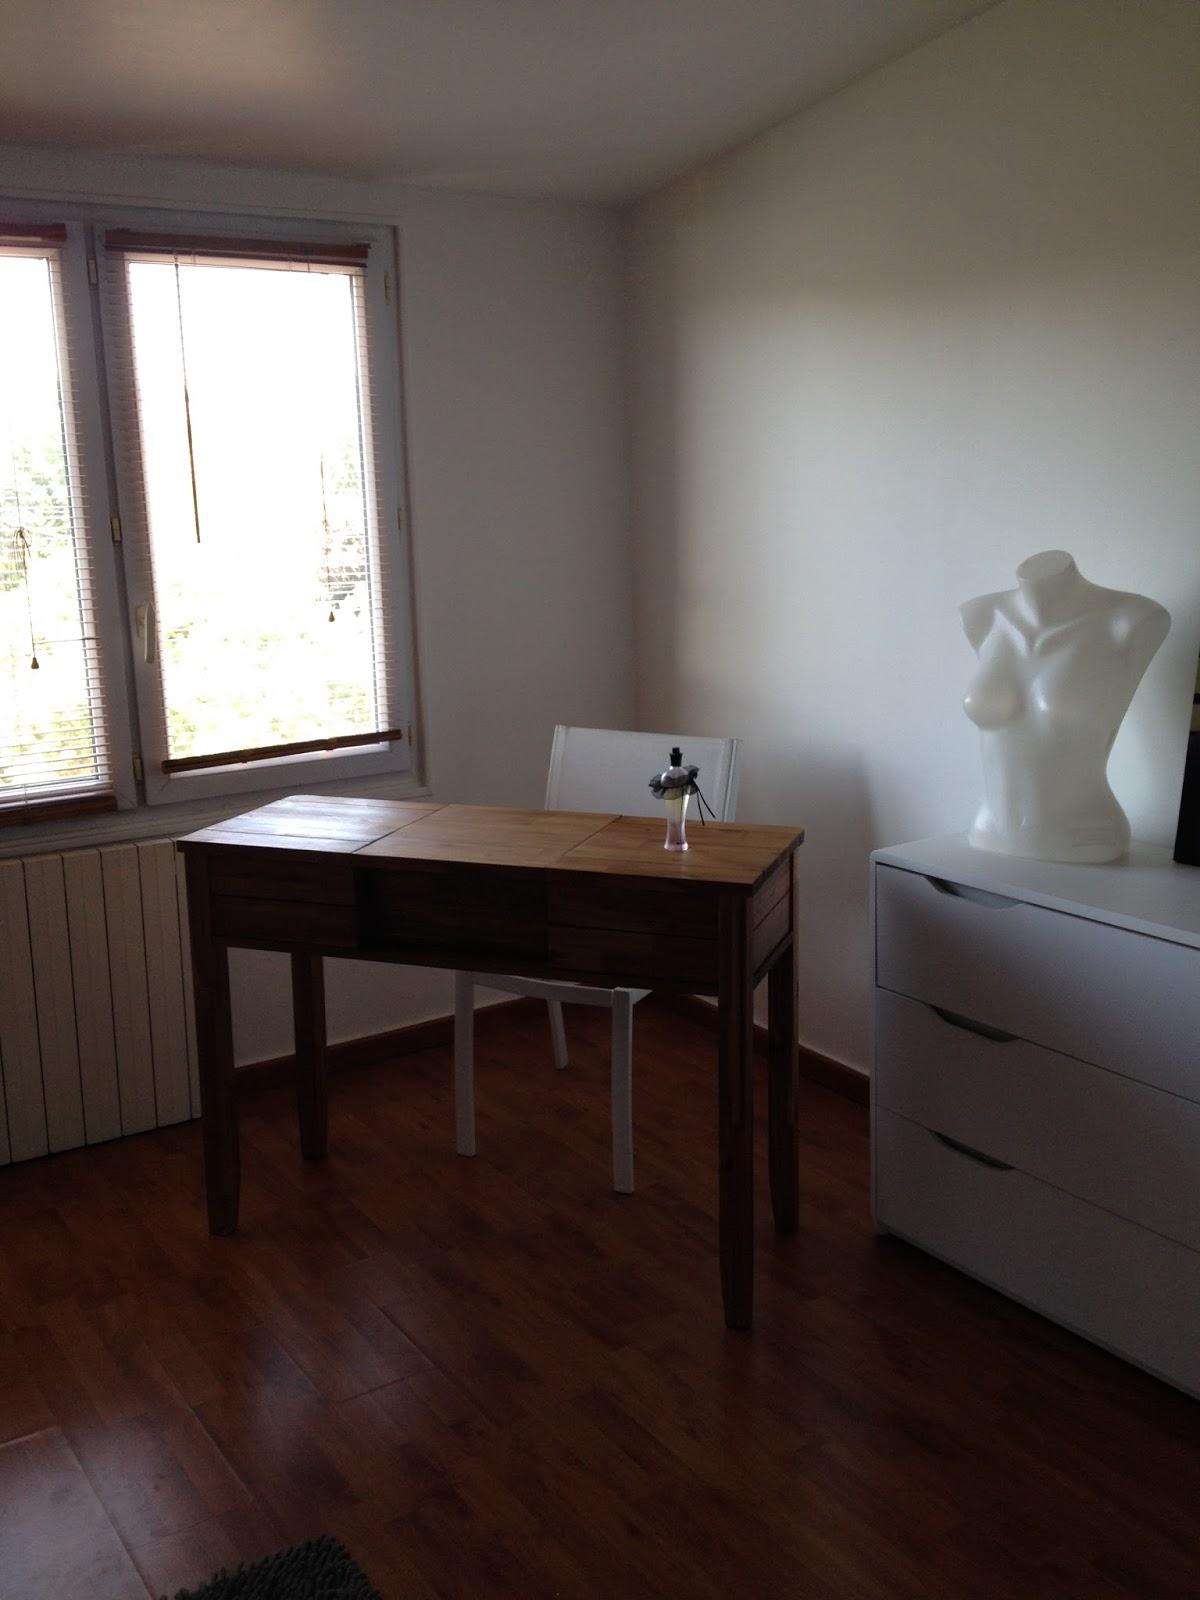 trendy ma jolie coiffeuse sobre et lgante prix canon alina with alinea thionville. Black Bedroom Furniture Sets. Home Design Ideas